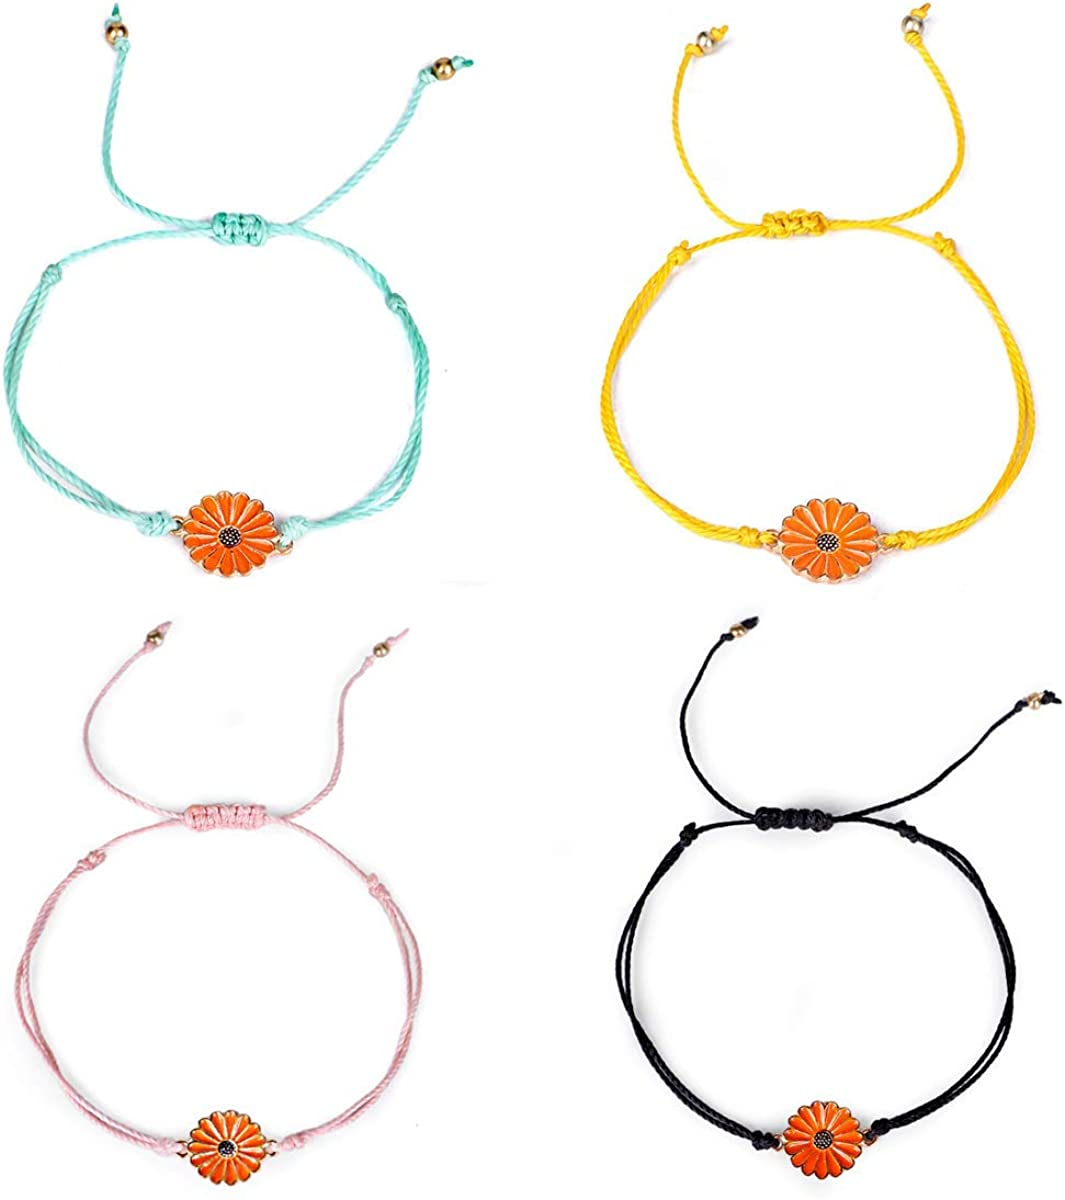 YELUWA Handmade Friendship Boho Sunflower Anklets//Bracelets for Women Teen Girls Daughter Sister Mom Gifts Waterproof Adjustable Rope Bracelet Set of 3